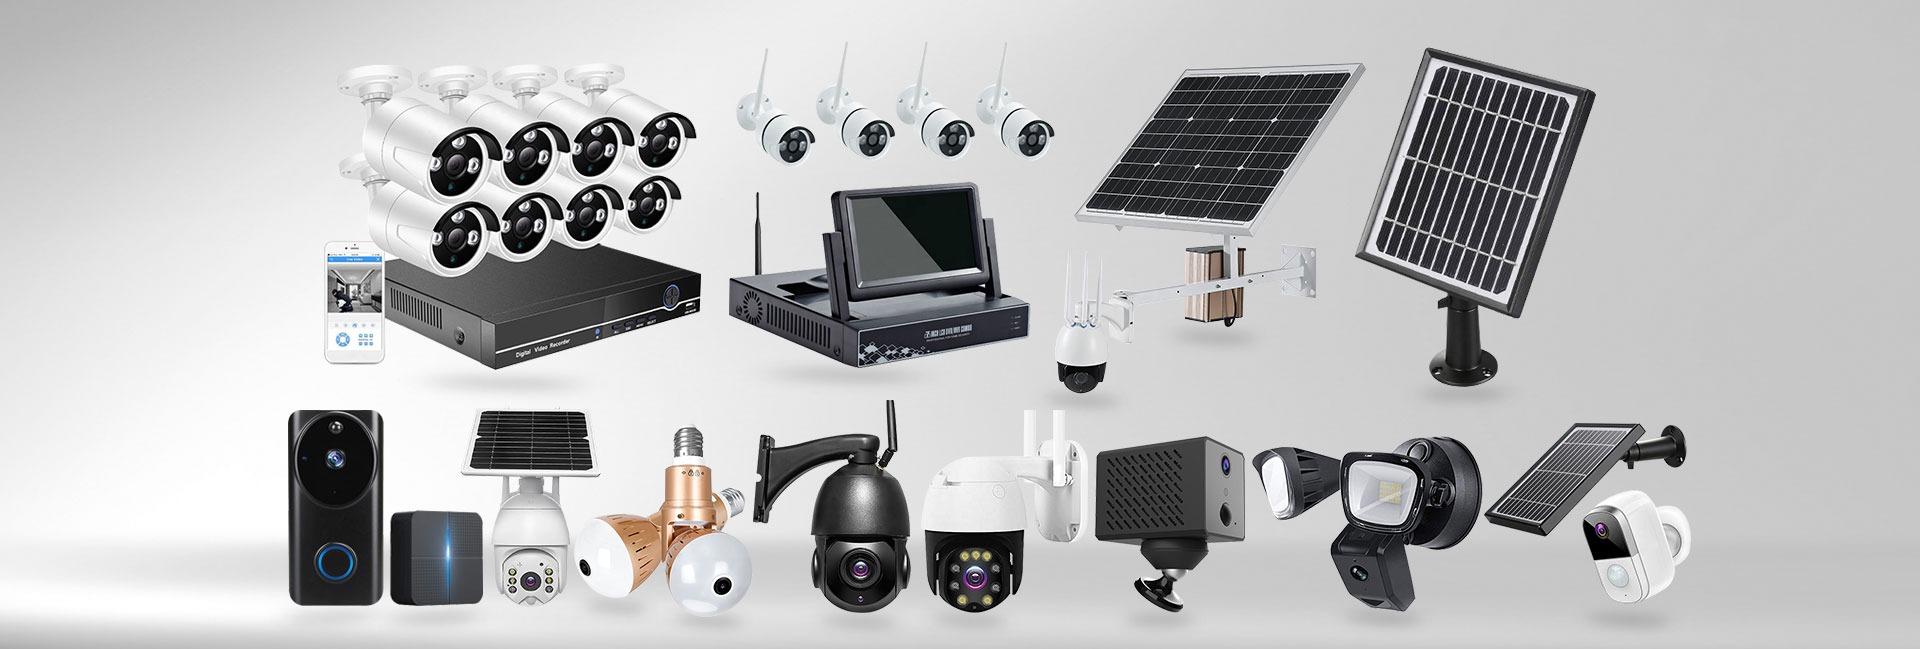 sistemi sicurezza video